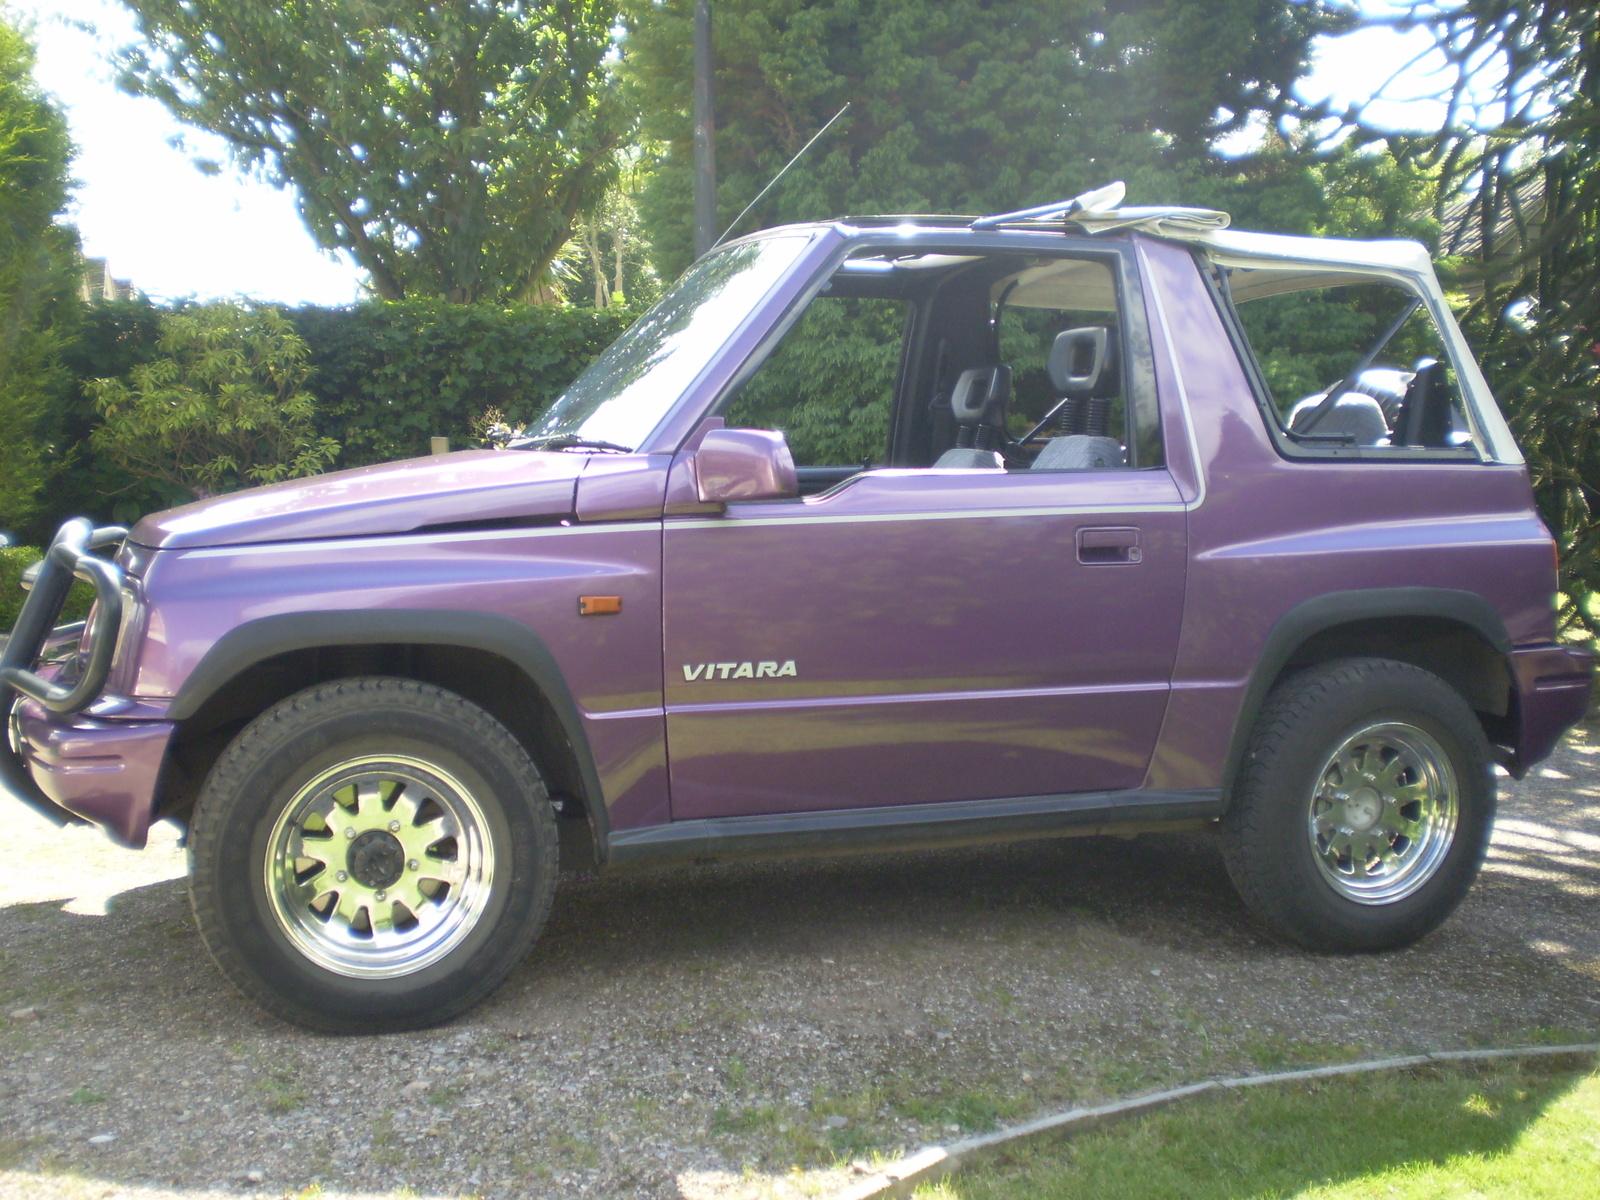 Used Suzuki Grand Vitara Manual For Sale In Fort Lauderdale